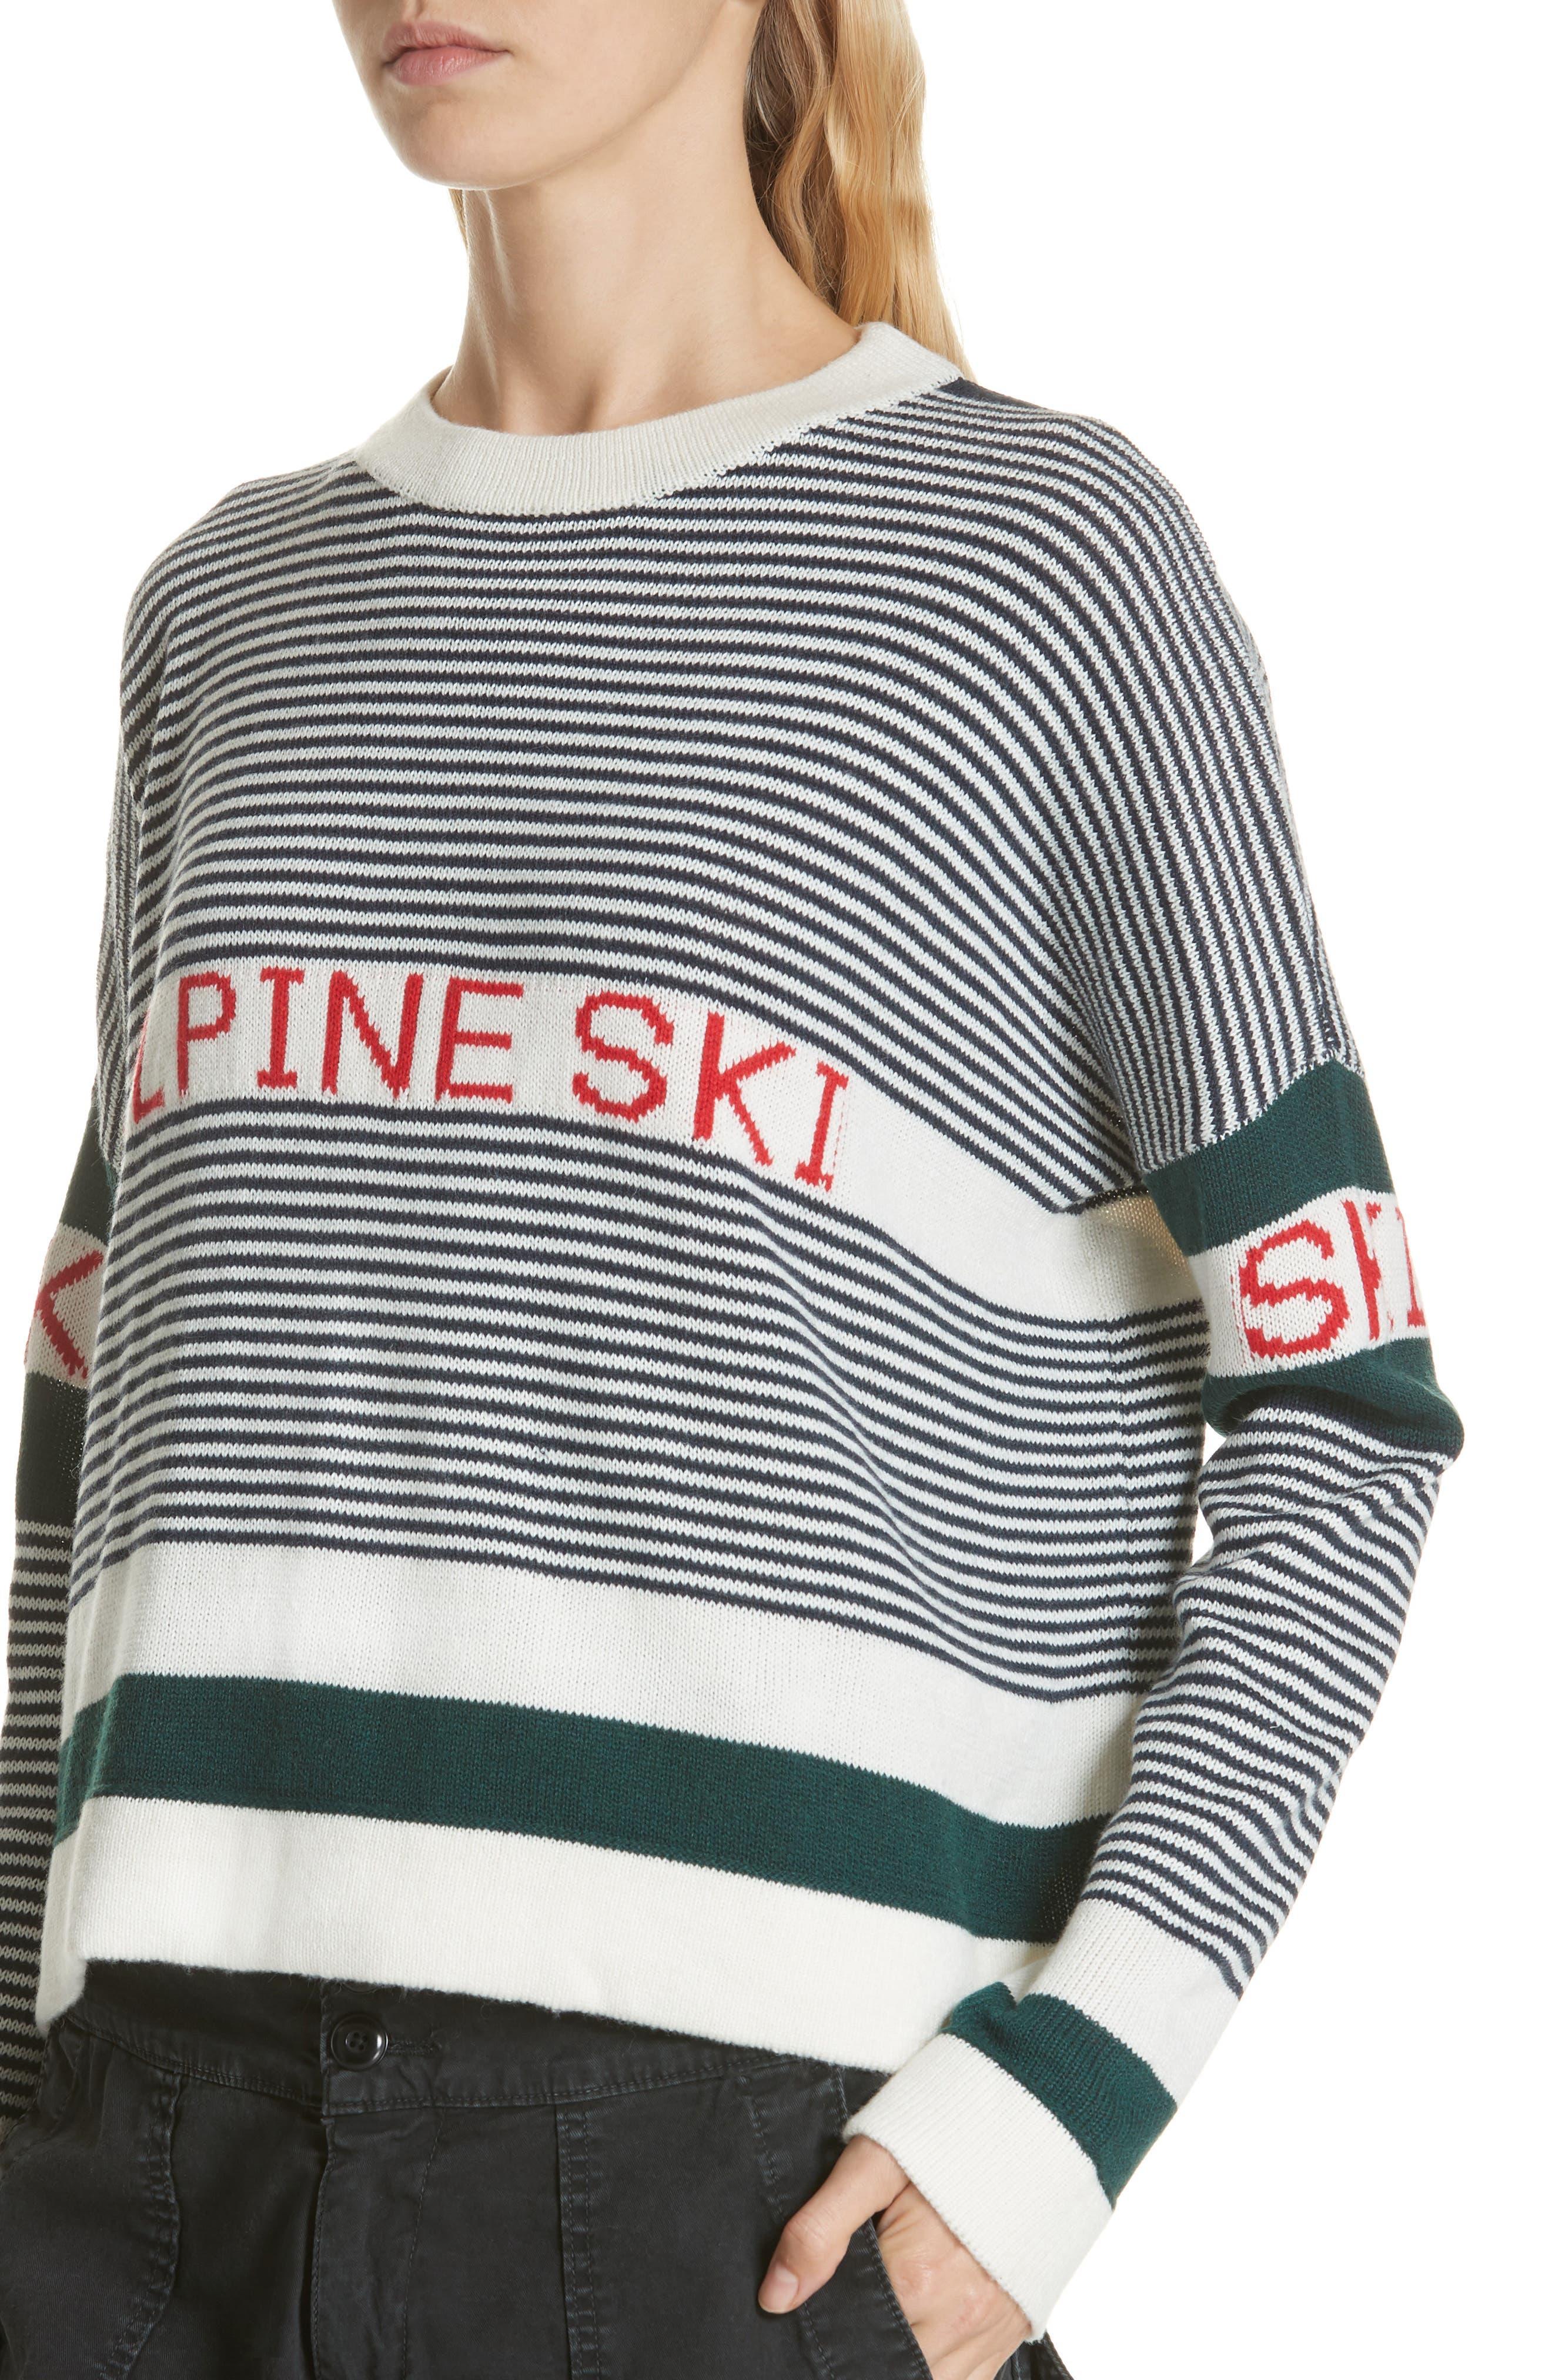 Alpine Ski Sweater,                             Alternate thumbnail 4, color,                             MULTI STRIPE